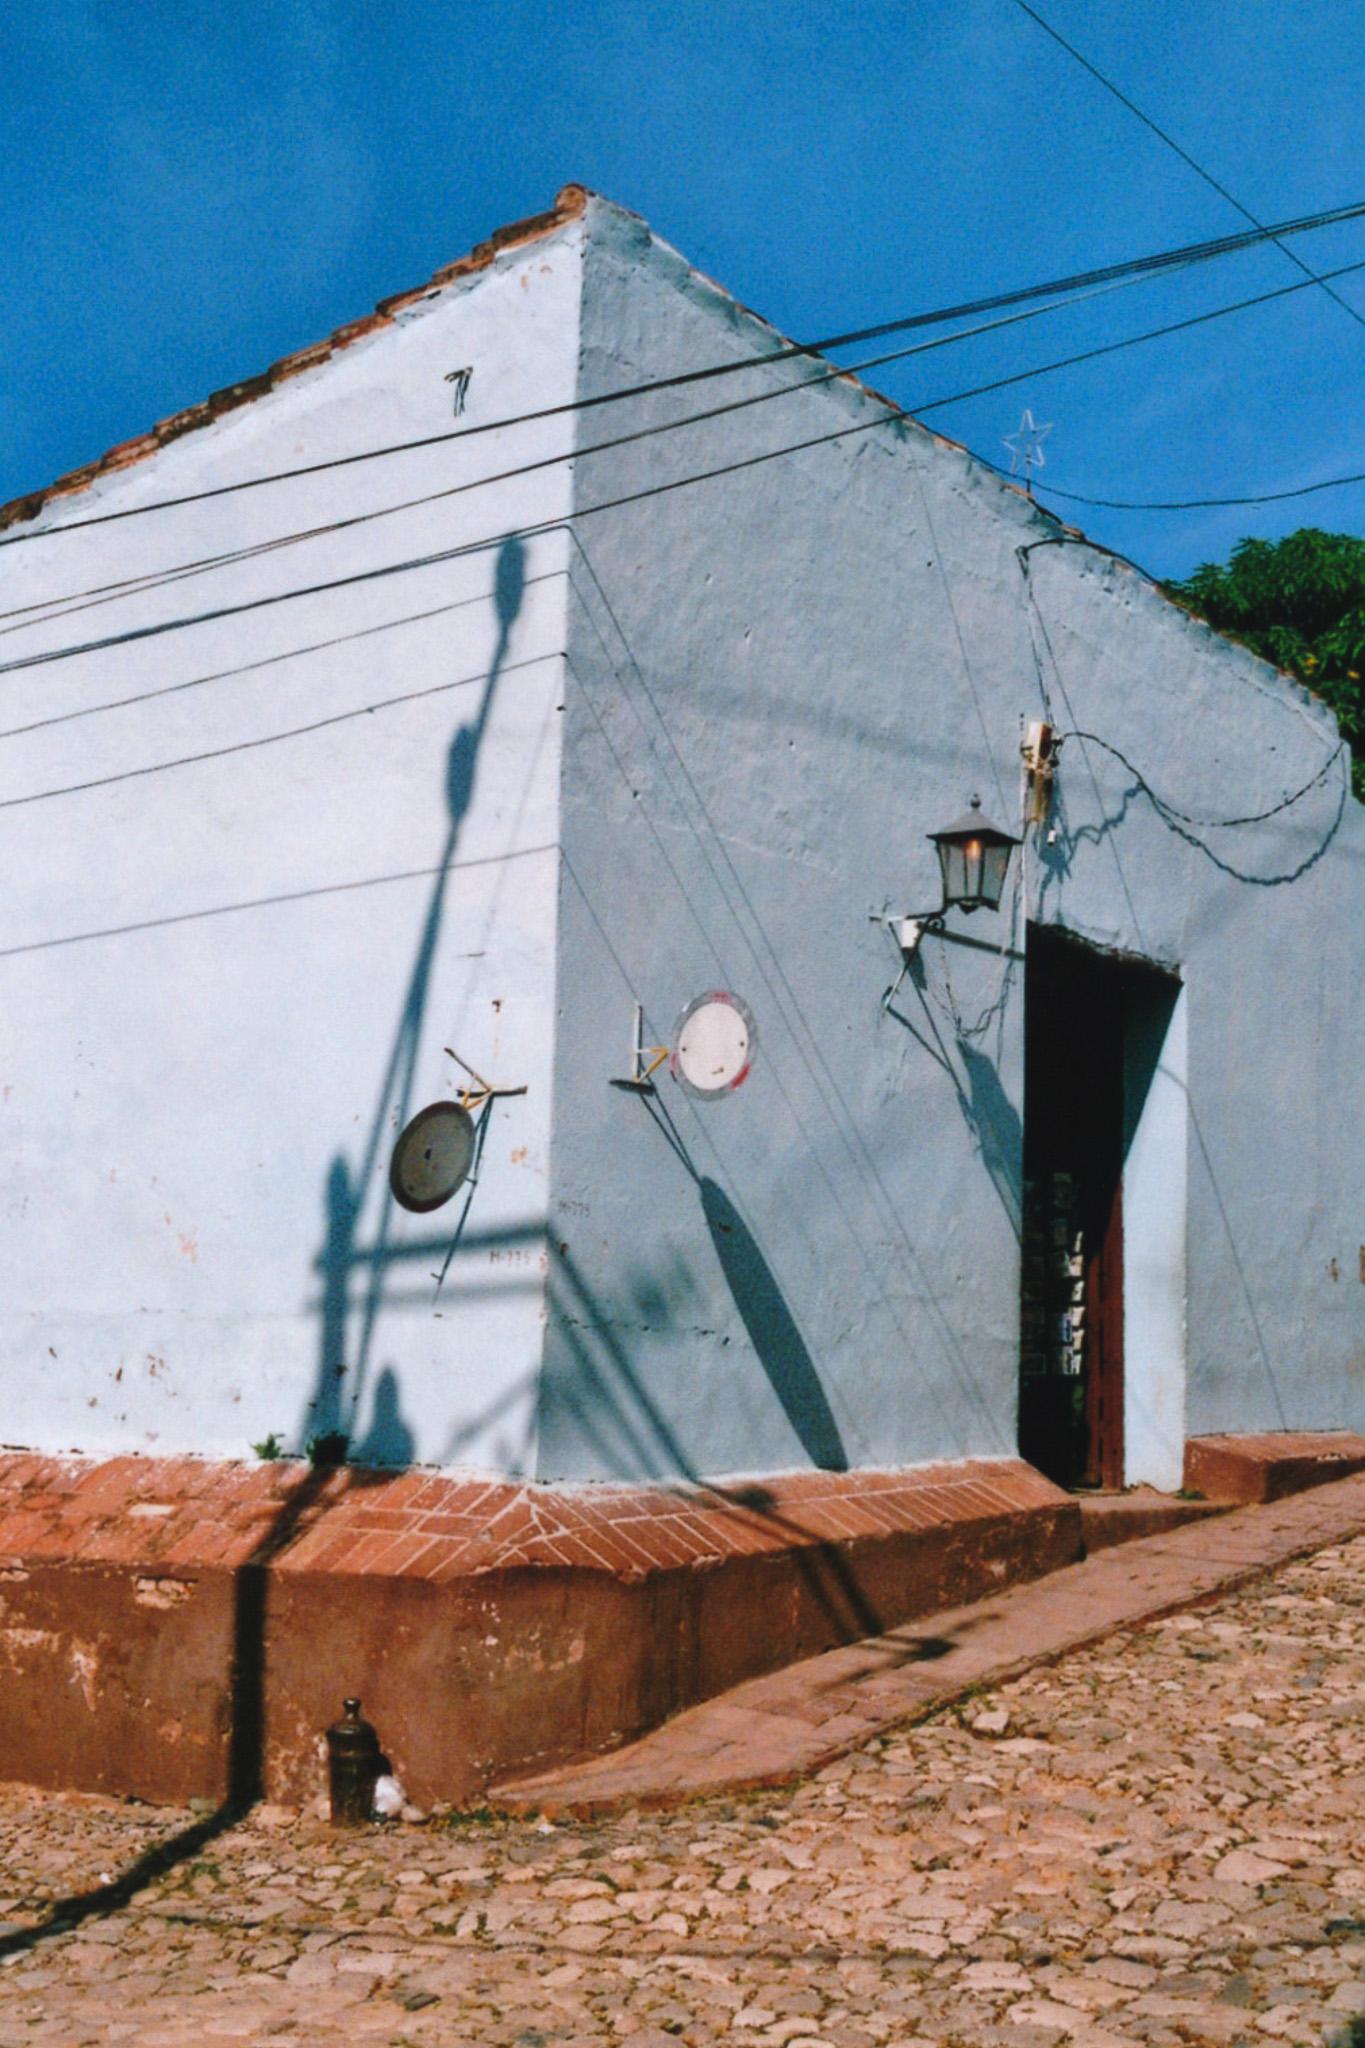 Kuba-2017-12-Analog-006.jpg